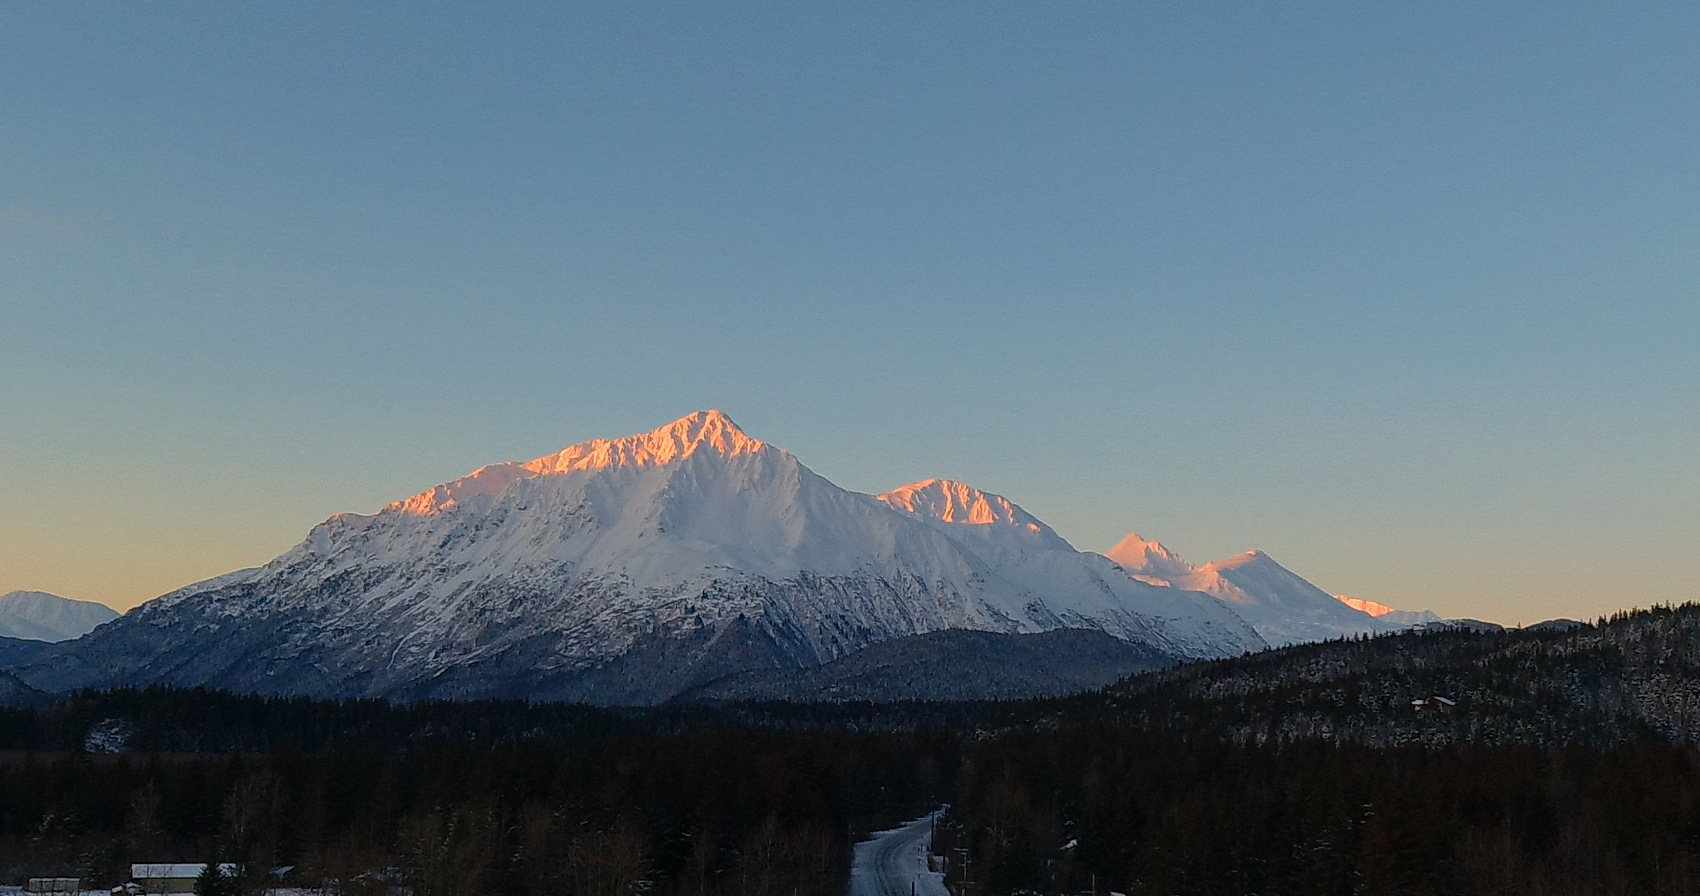 6.2-magnitude quake hits 22km E of Tanaga Volcano, Alaska: USGS